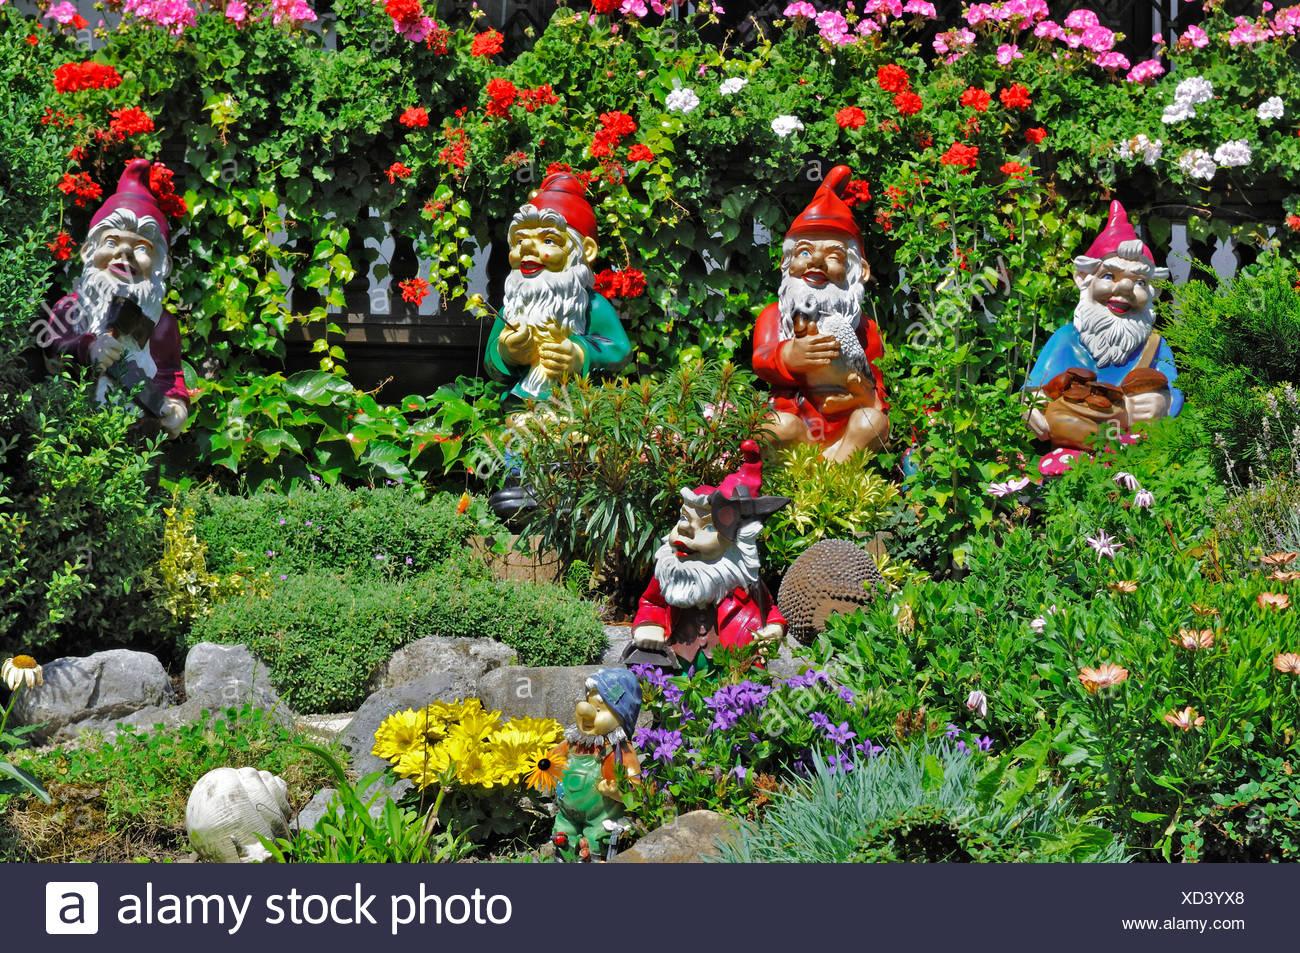 Garden Dwarfs Stock Photos & Garden Dwarfs Stock Images - Alamy on